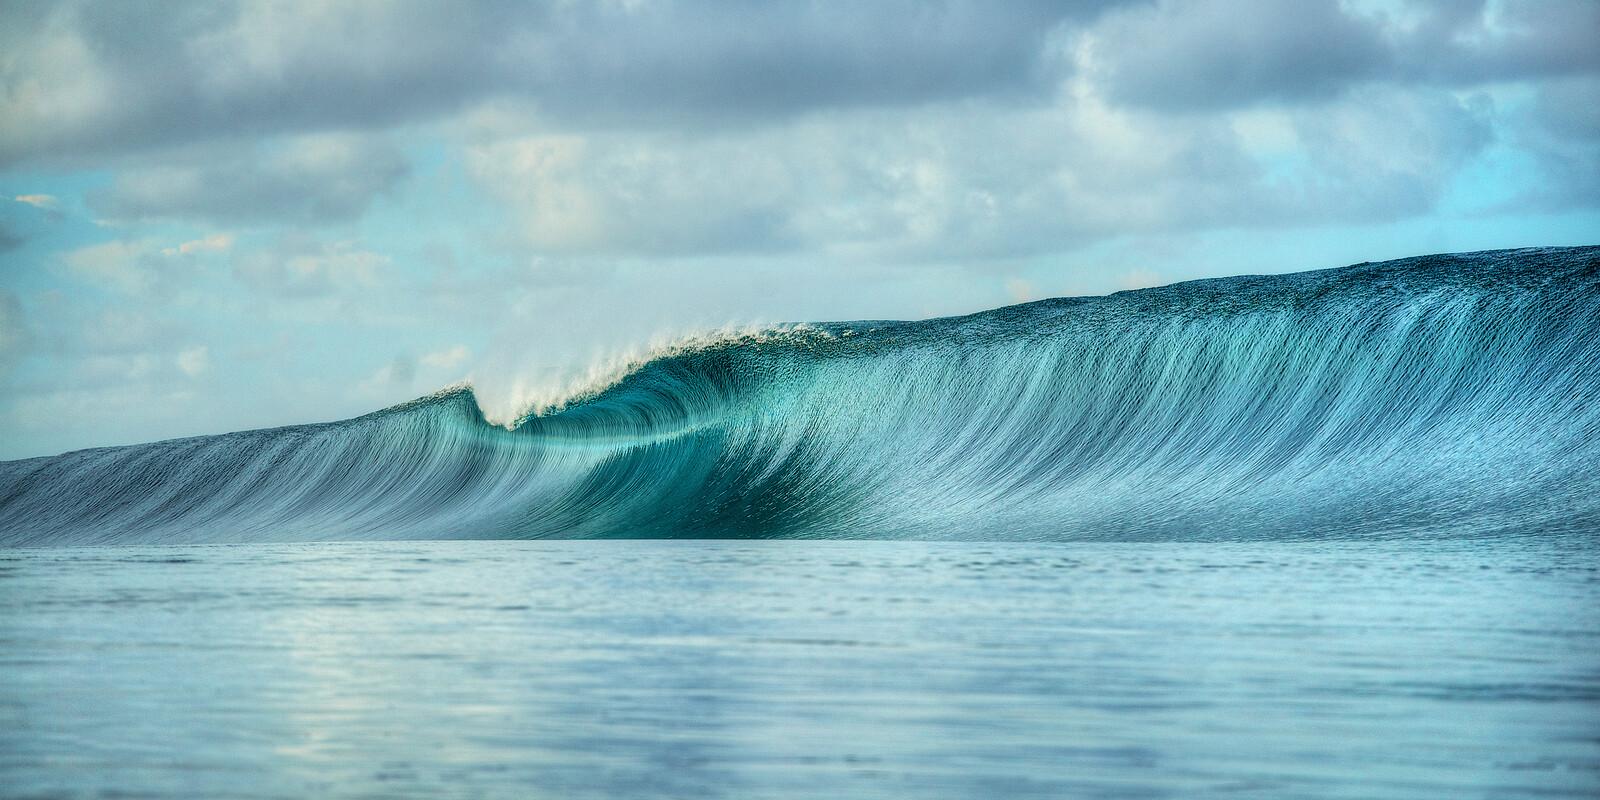 Surreal Perfection - Tim Mckenna